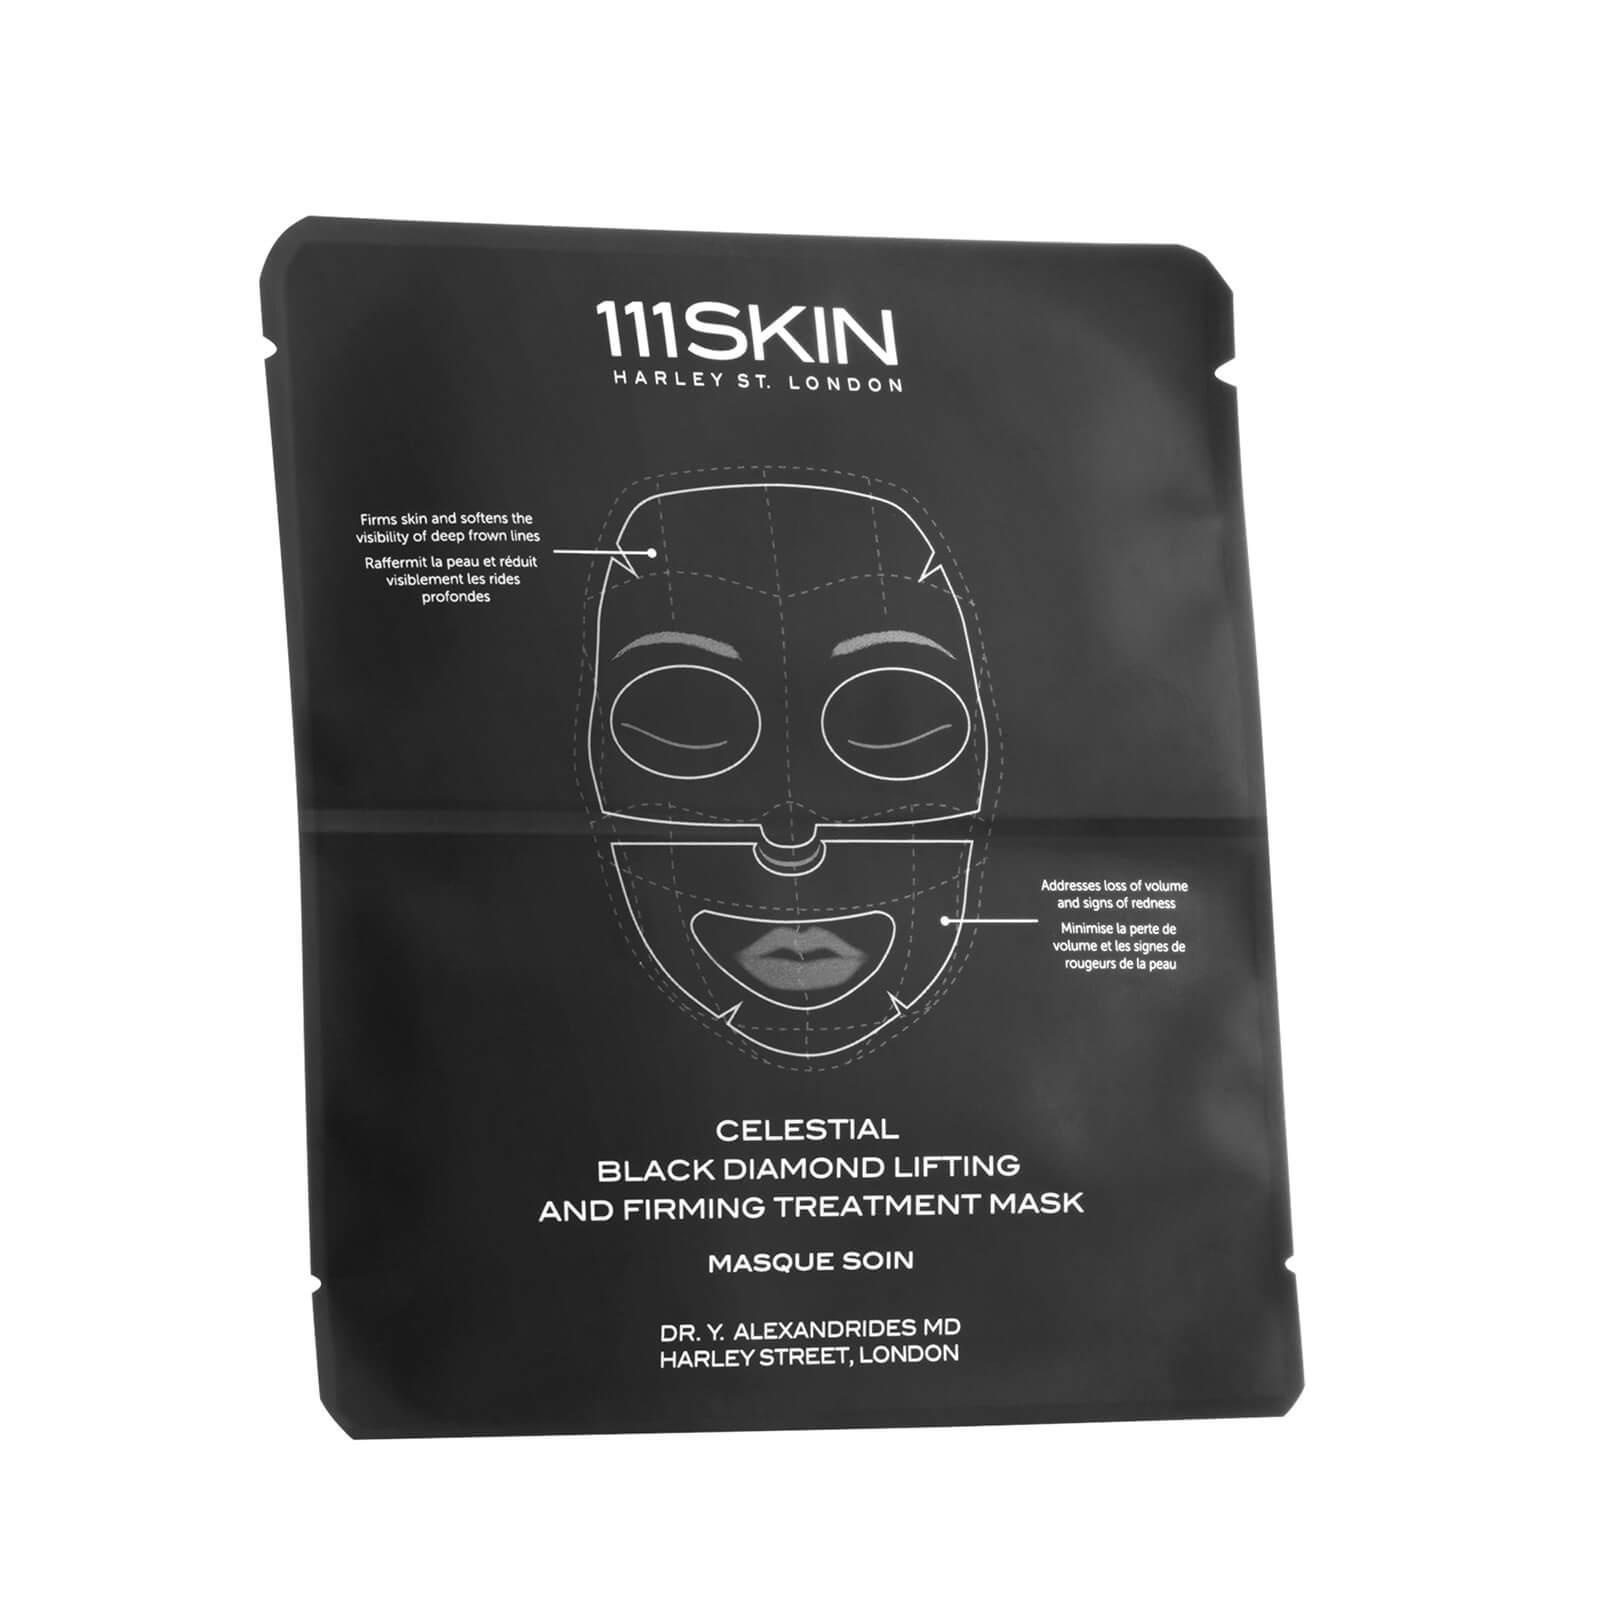 Купить 111SKIN Celestial Black Diamond Lifting and Firming Mask Face Single 31ml